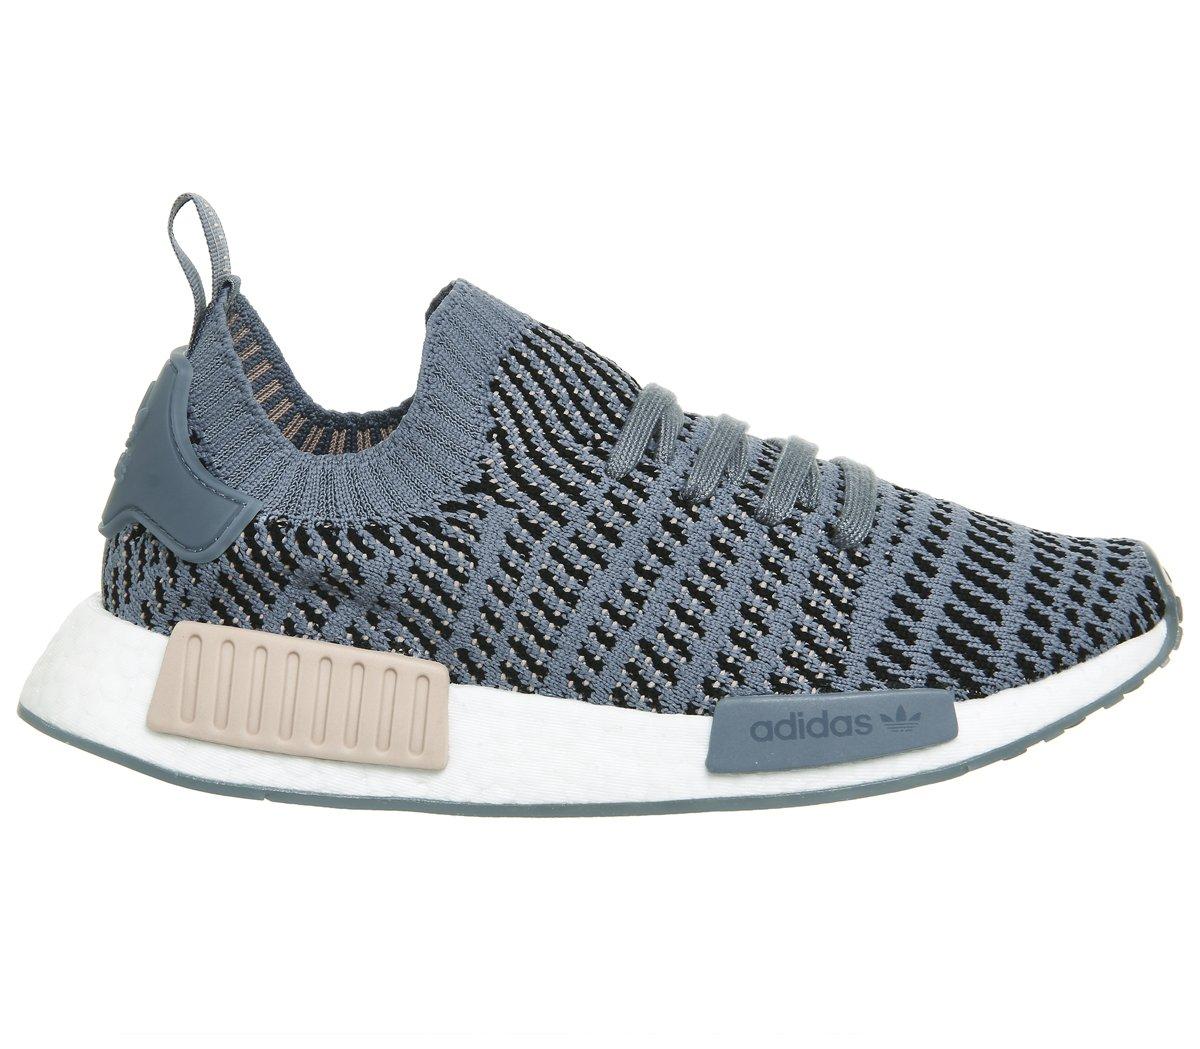 Adidas NMD_r1 Stlt Primeknit, Zapatillas para Mujer 37 1/3 EU|Azul